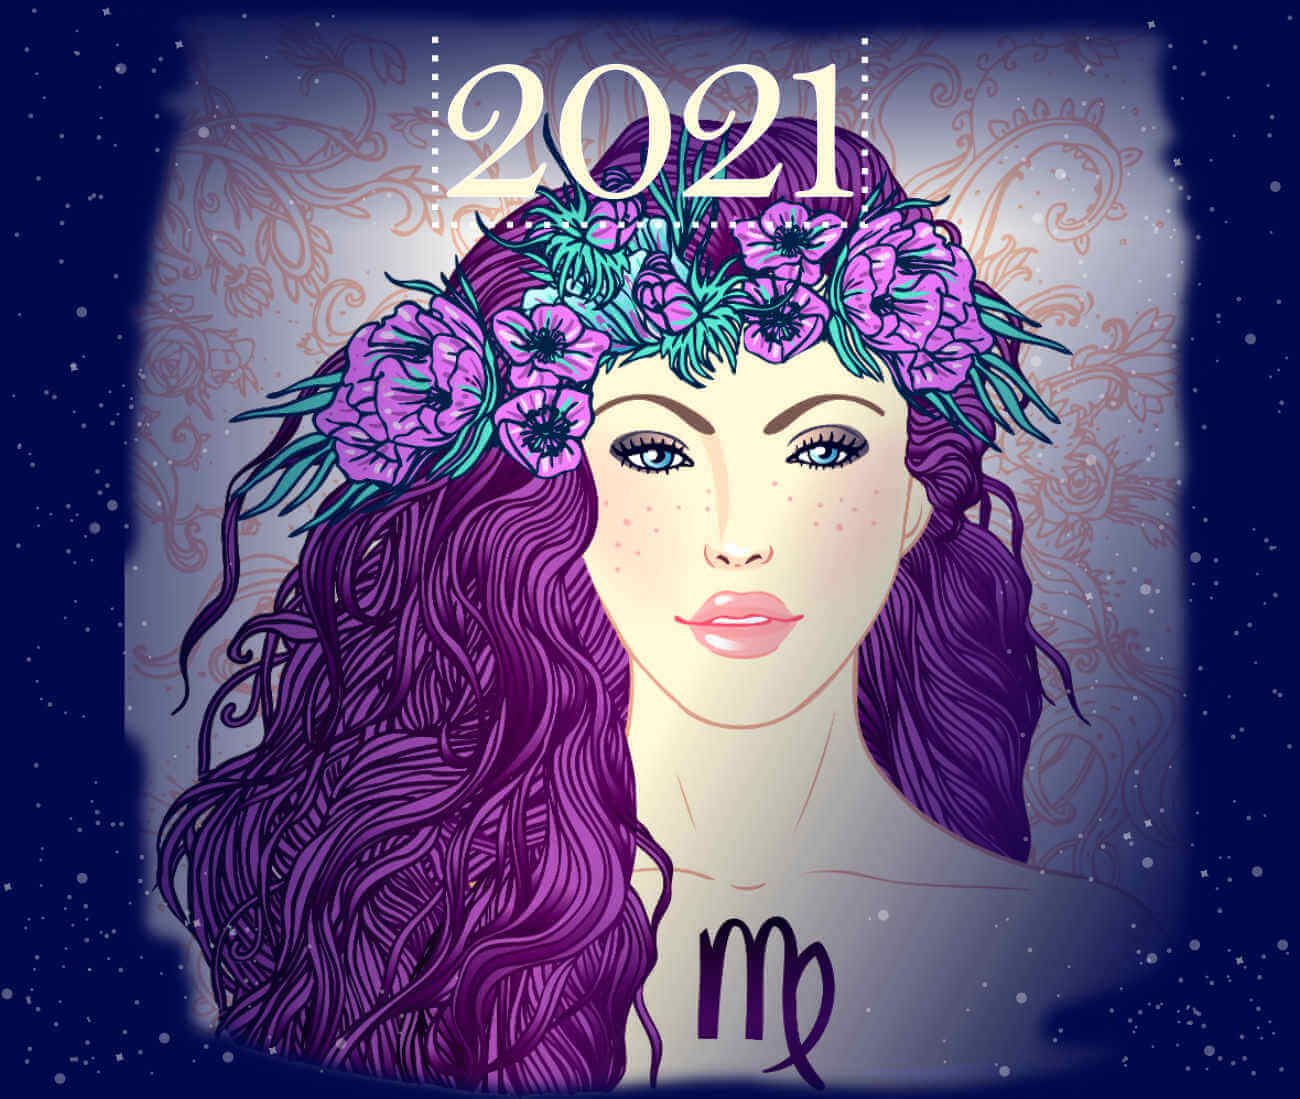 Find your fate 2021 virgo